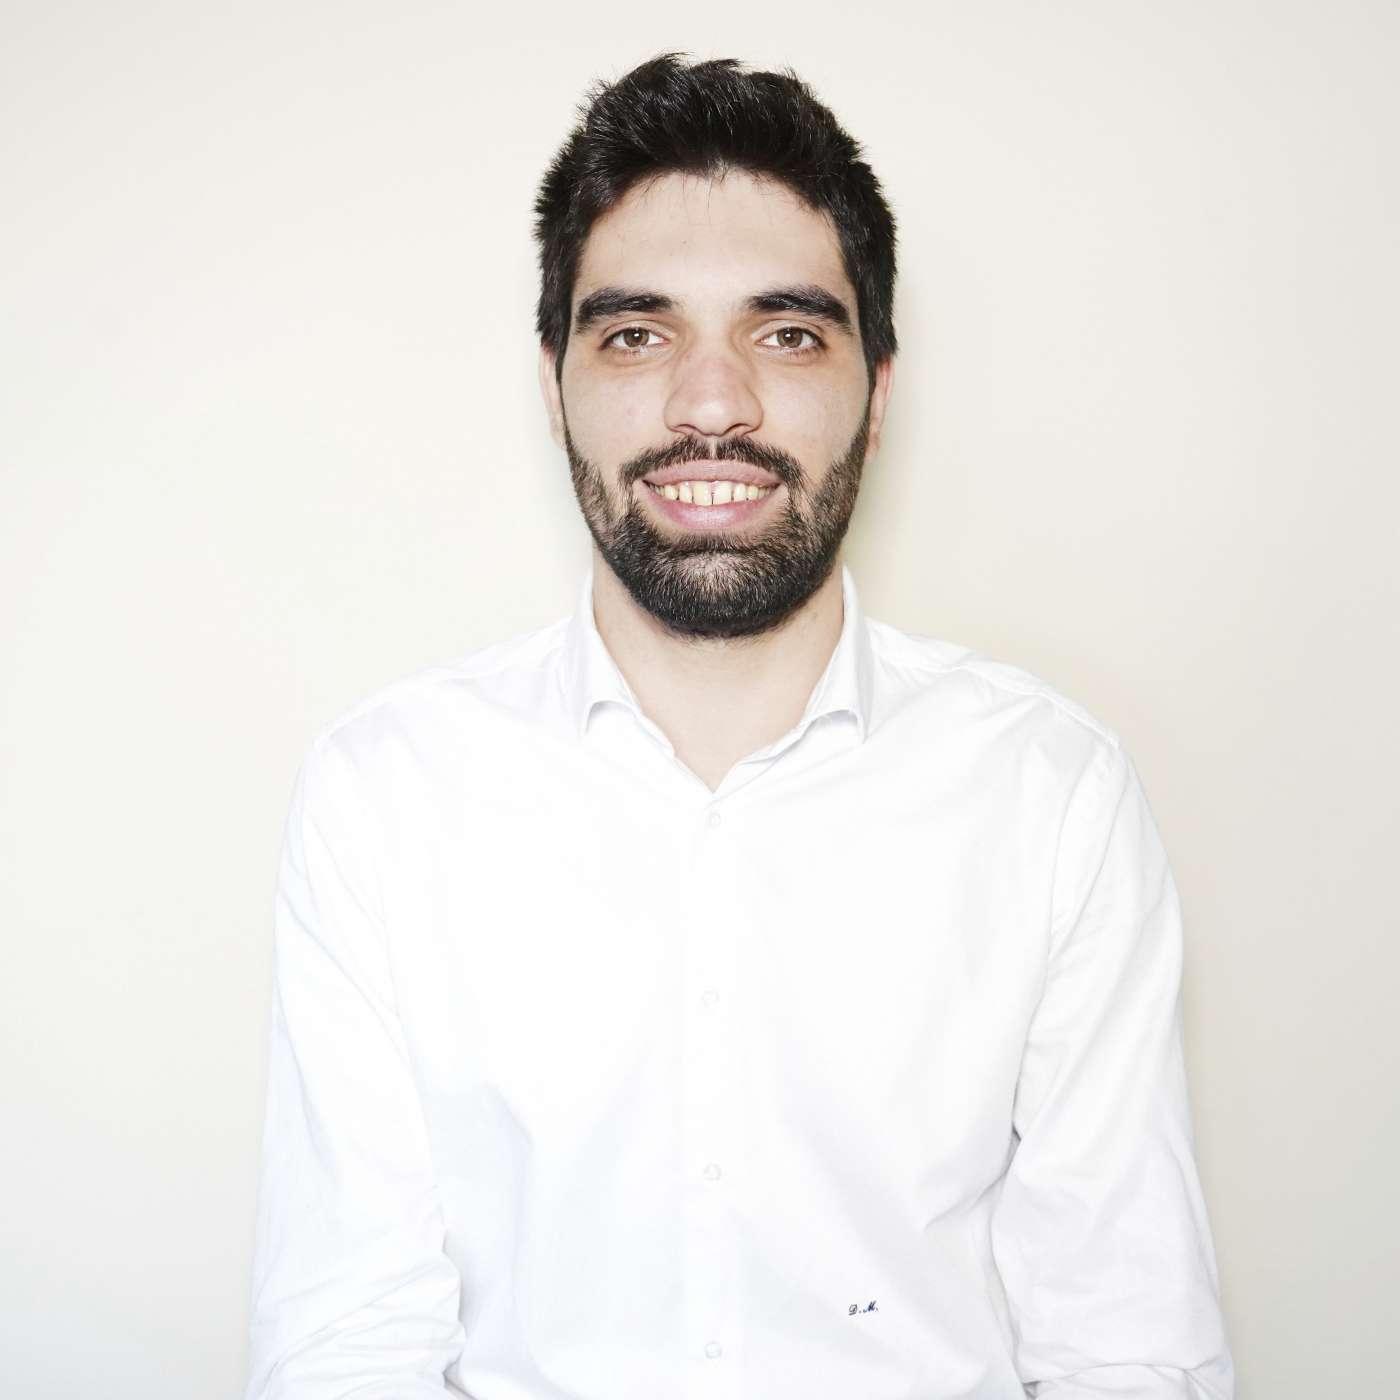 David Mammano